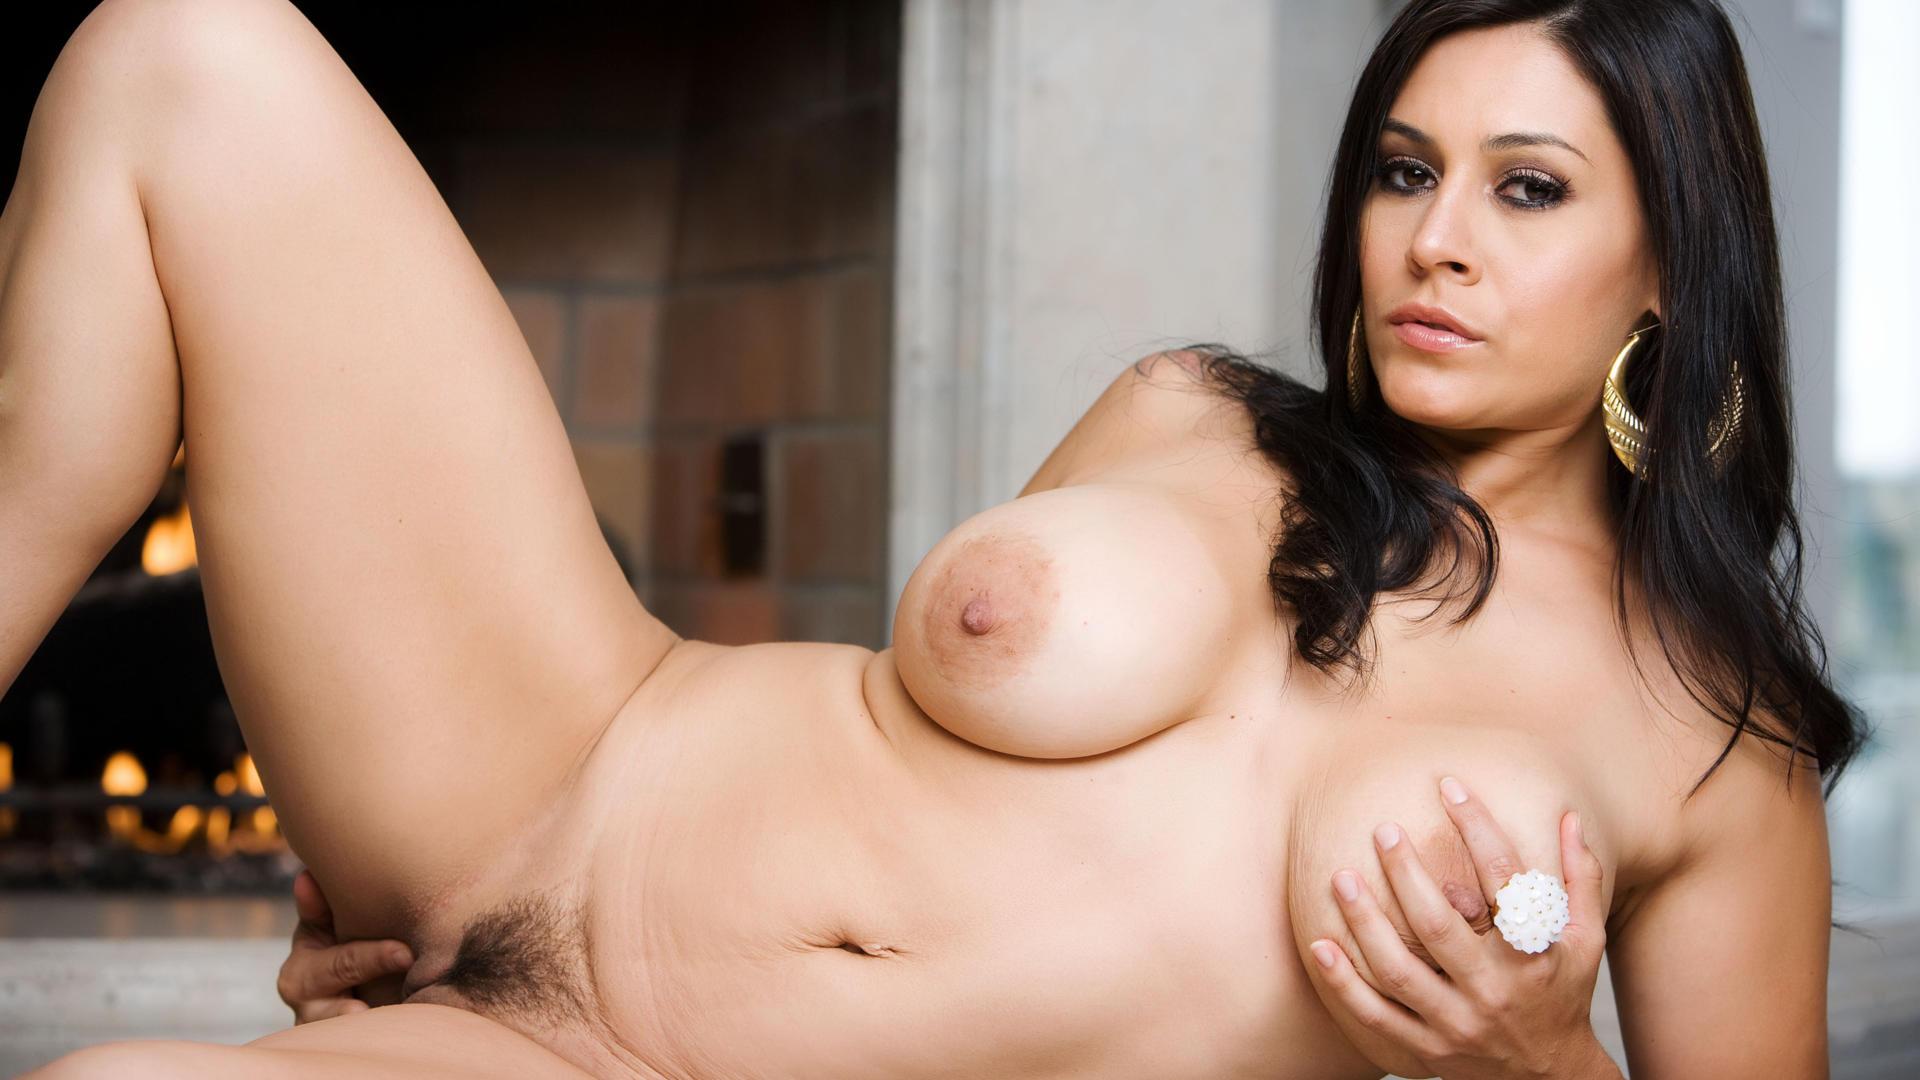 Raylene nude pic